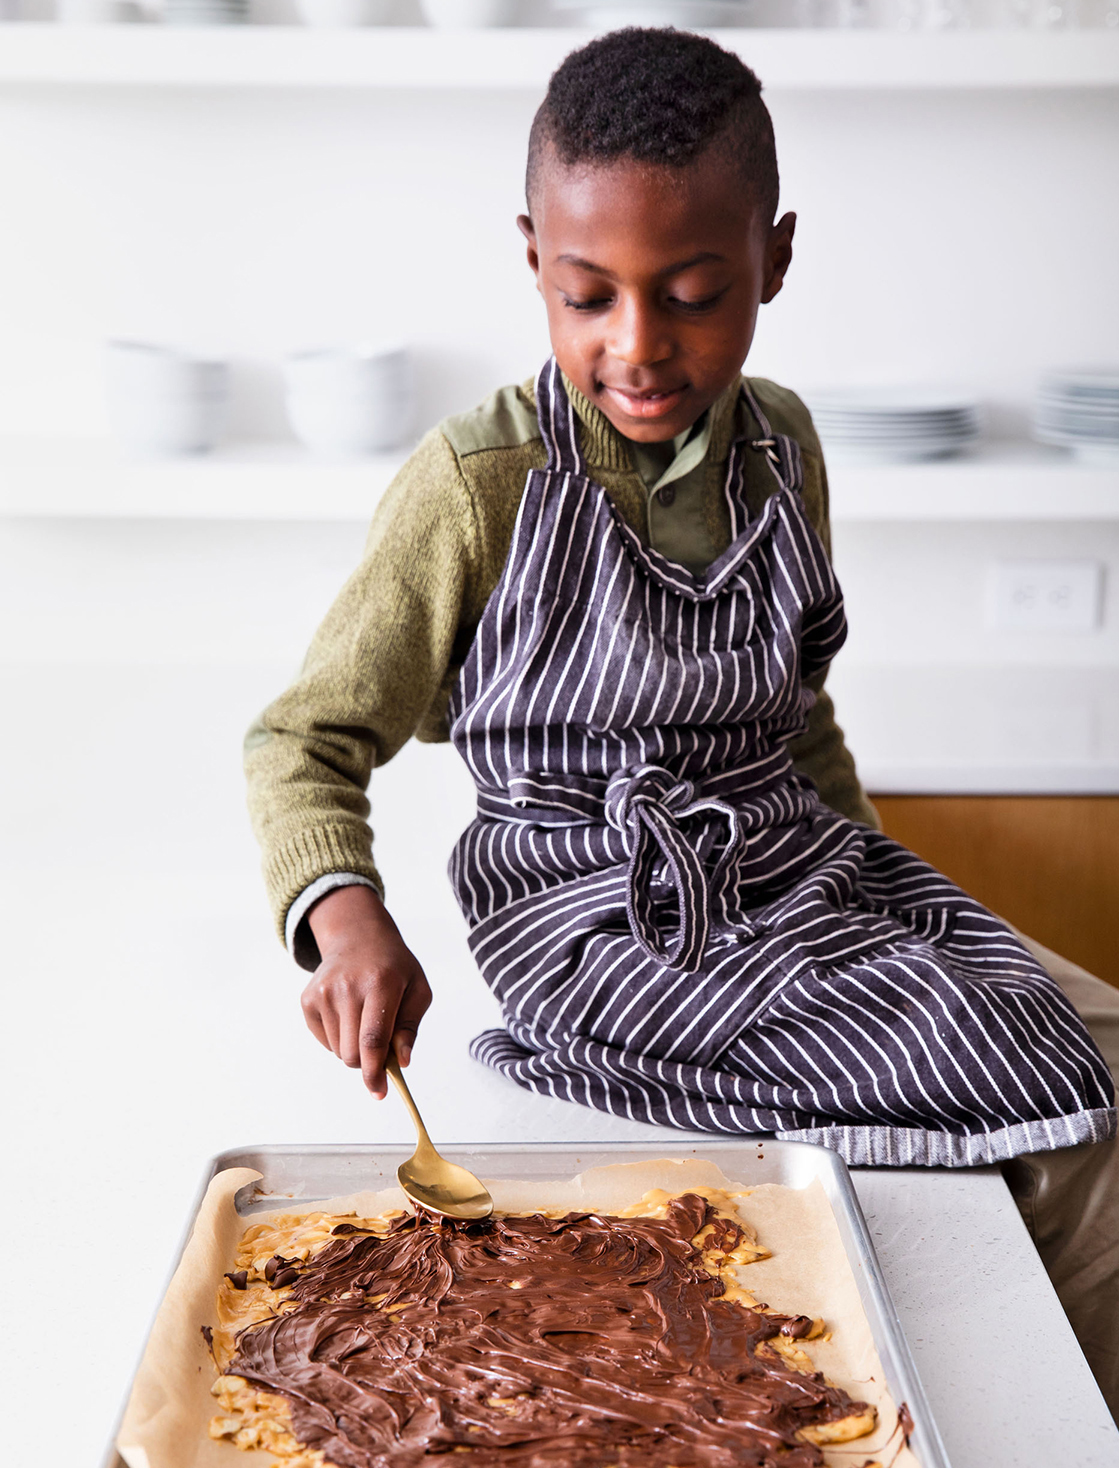 boy spreading chocolate on bark